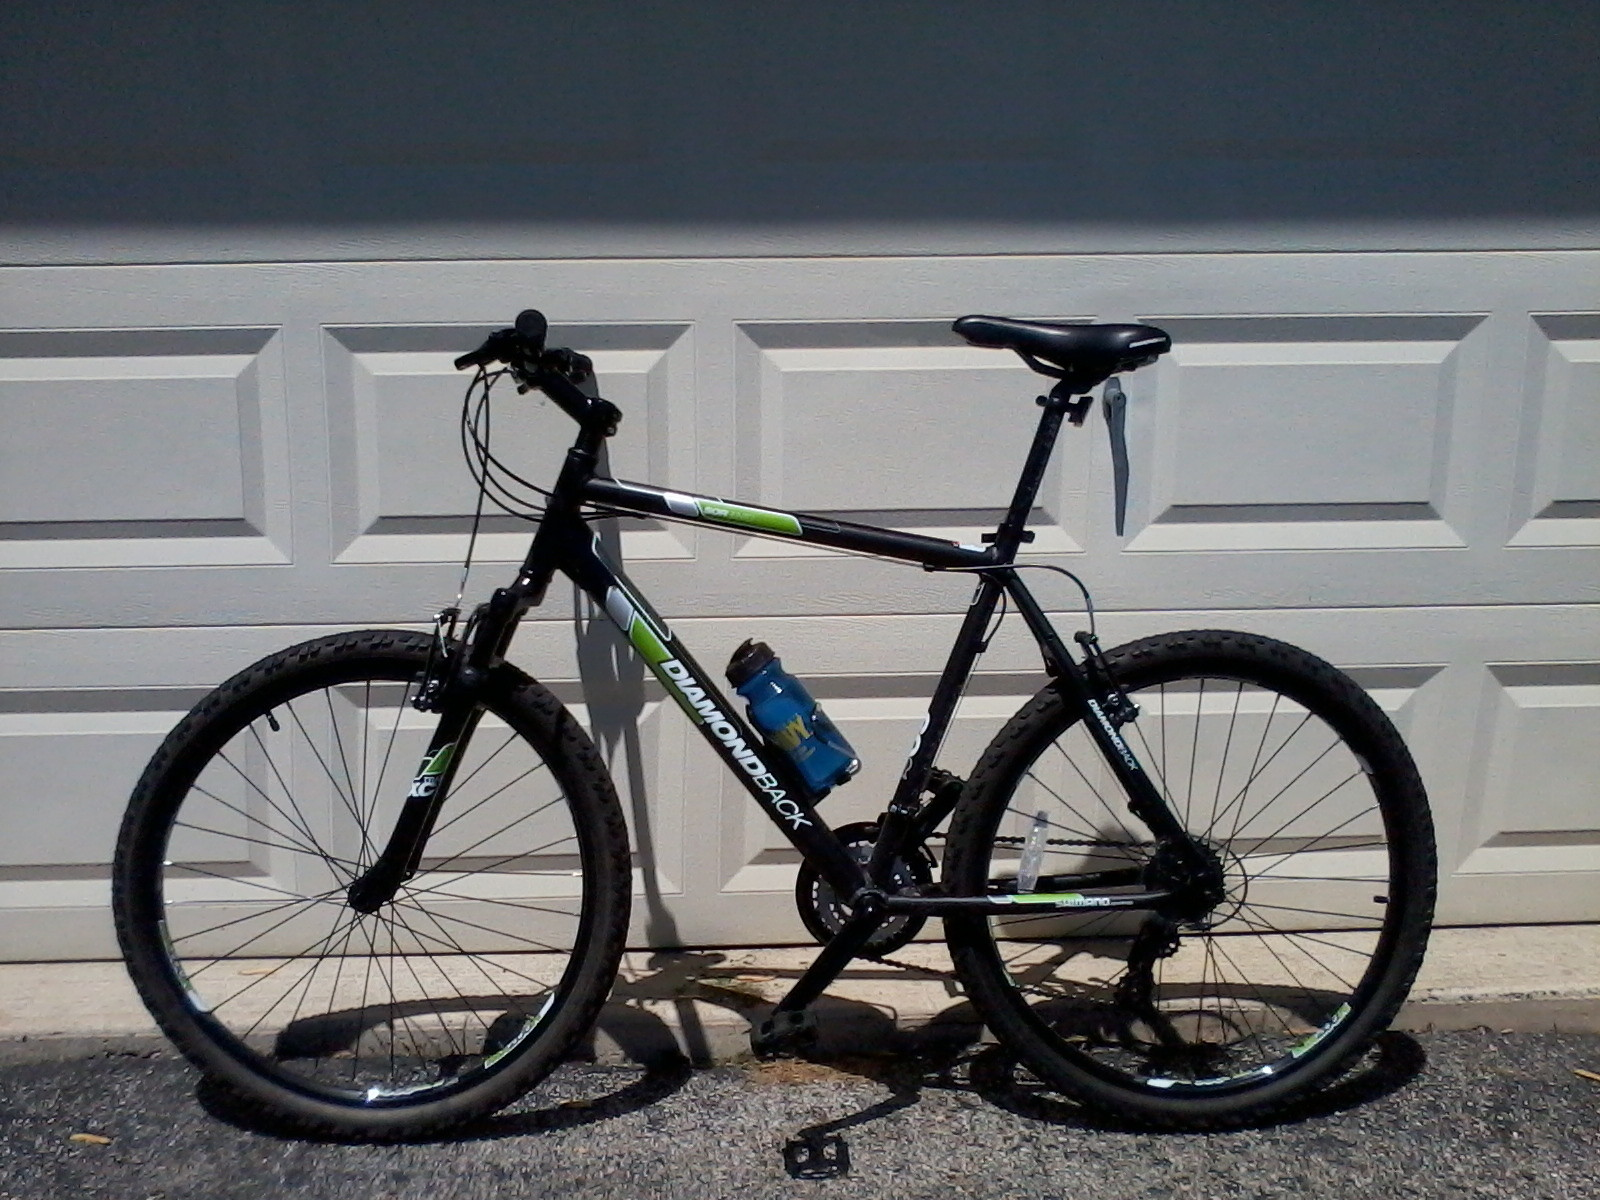 140529 107 - MadMaxFlexin - Mountain Biking Pictures - Vital MTB